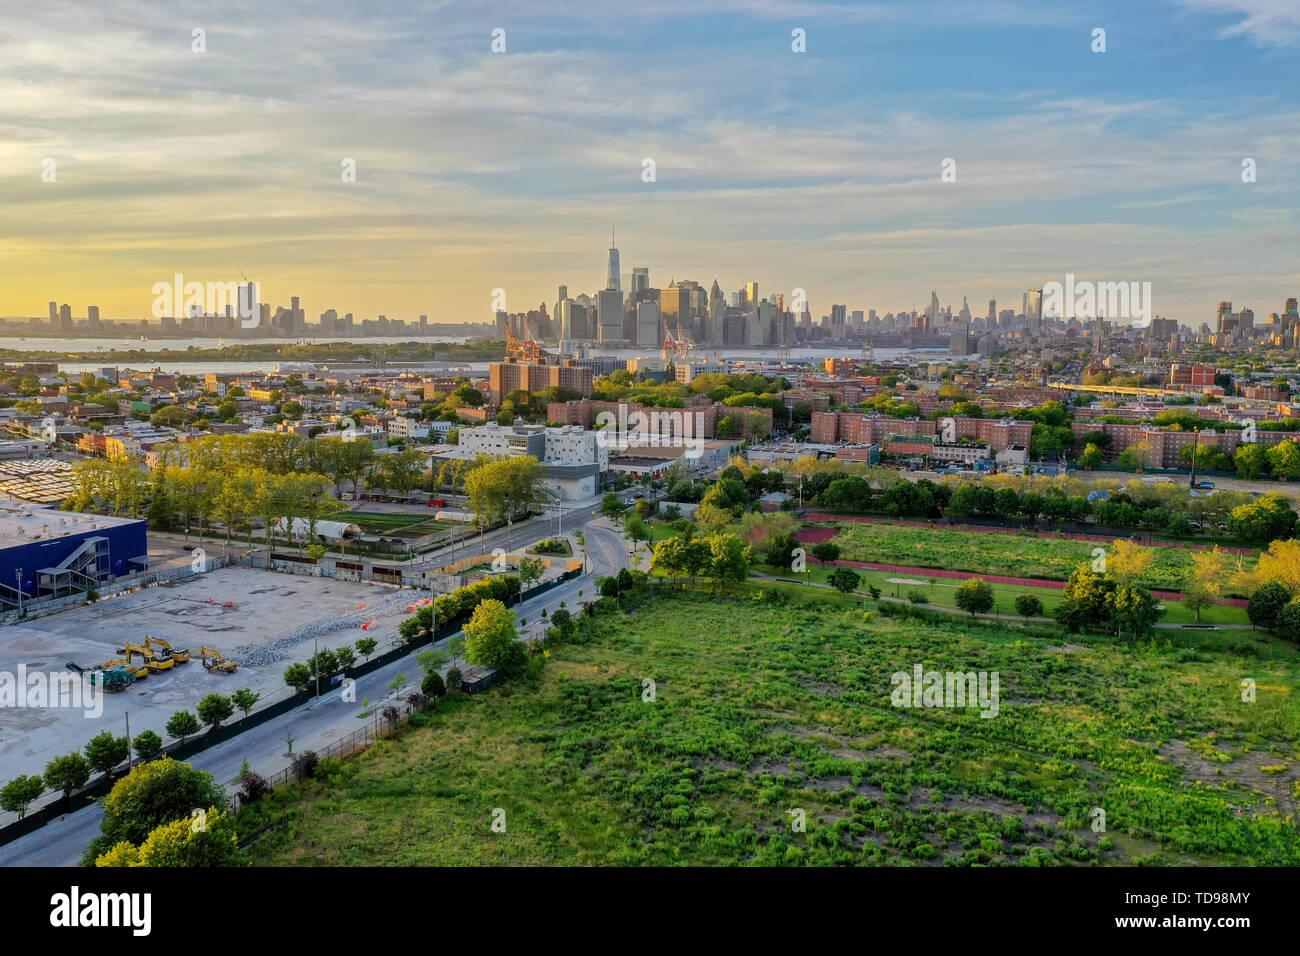 The Red Hook Grain Terminal in the Red Hook neighborhood of Brooklyn, New York. - Stock Image